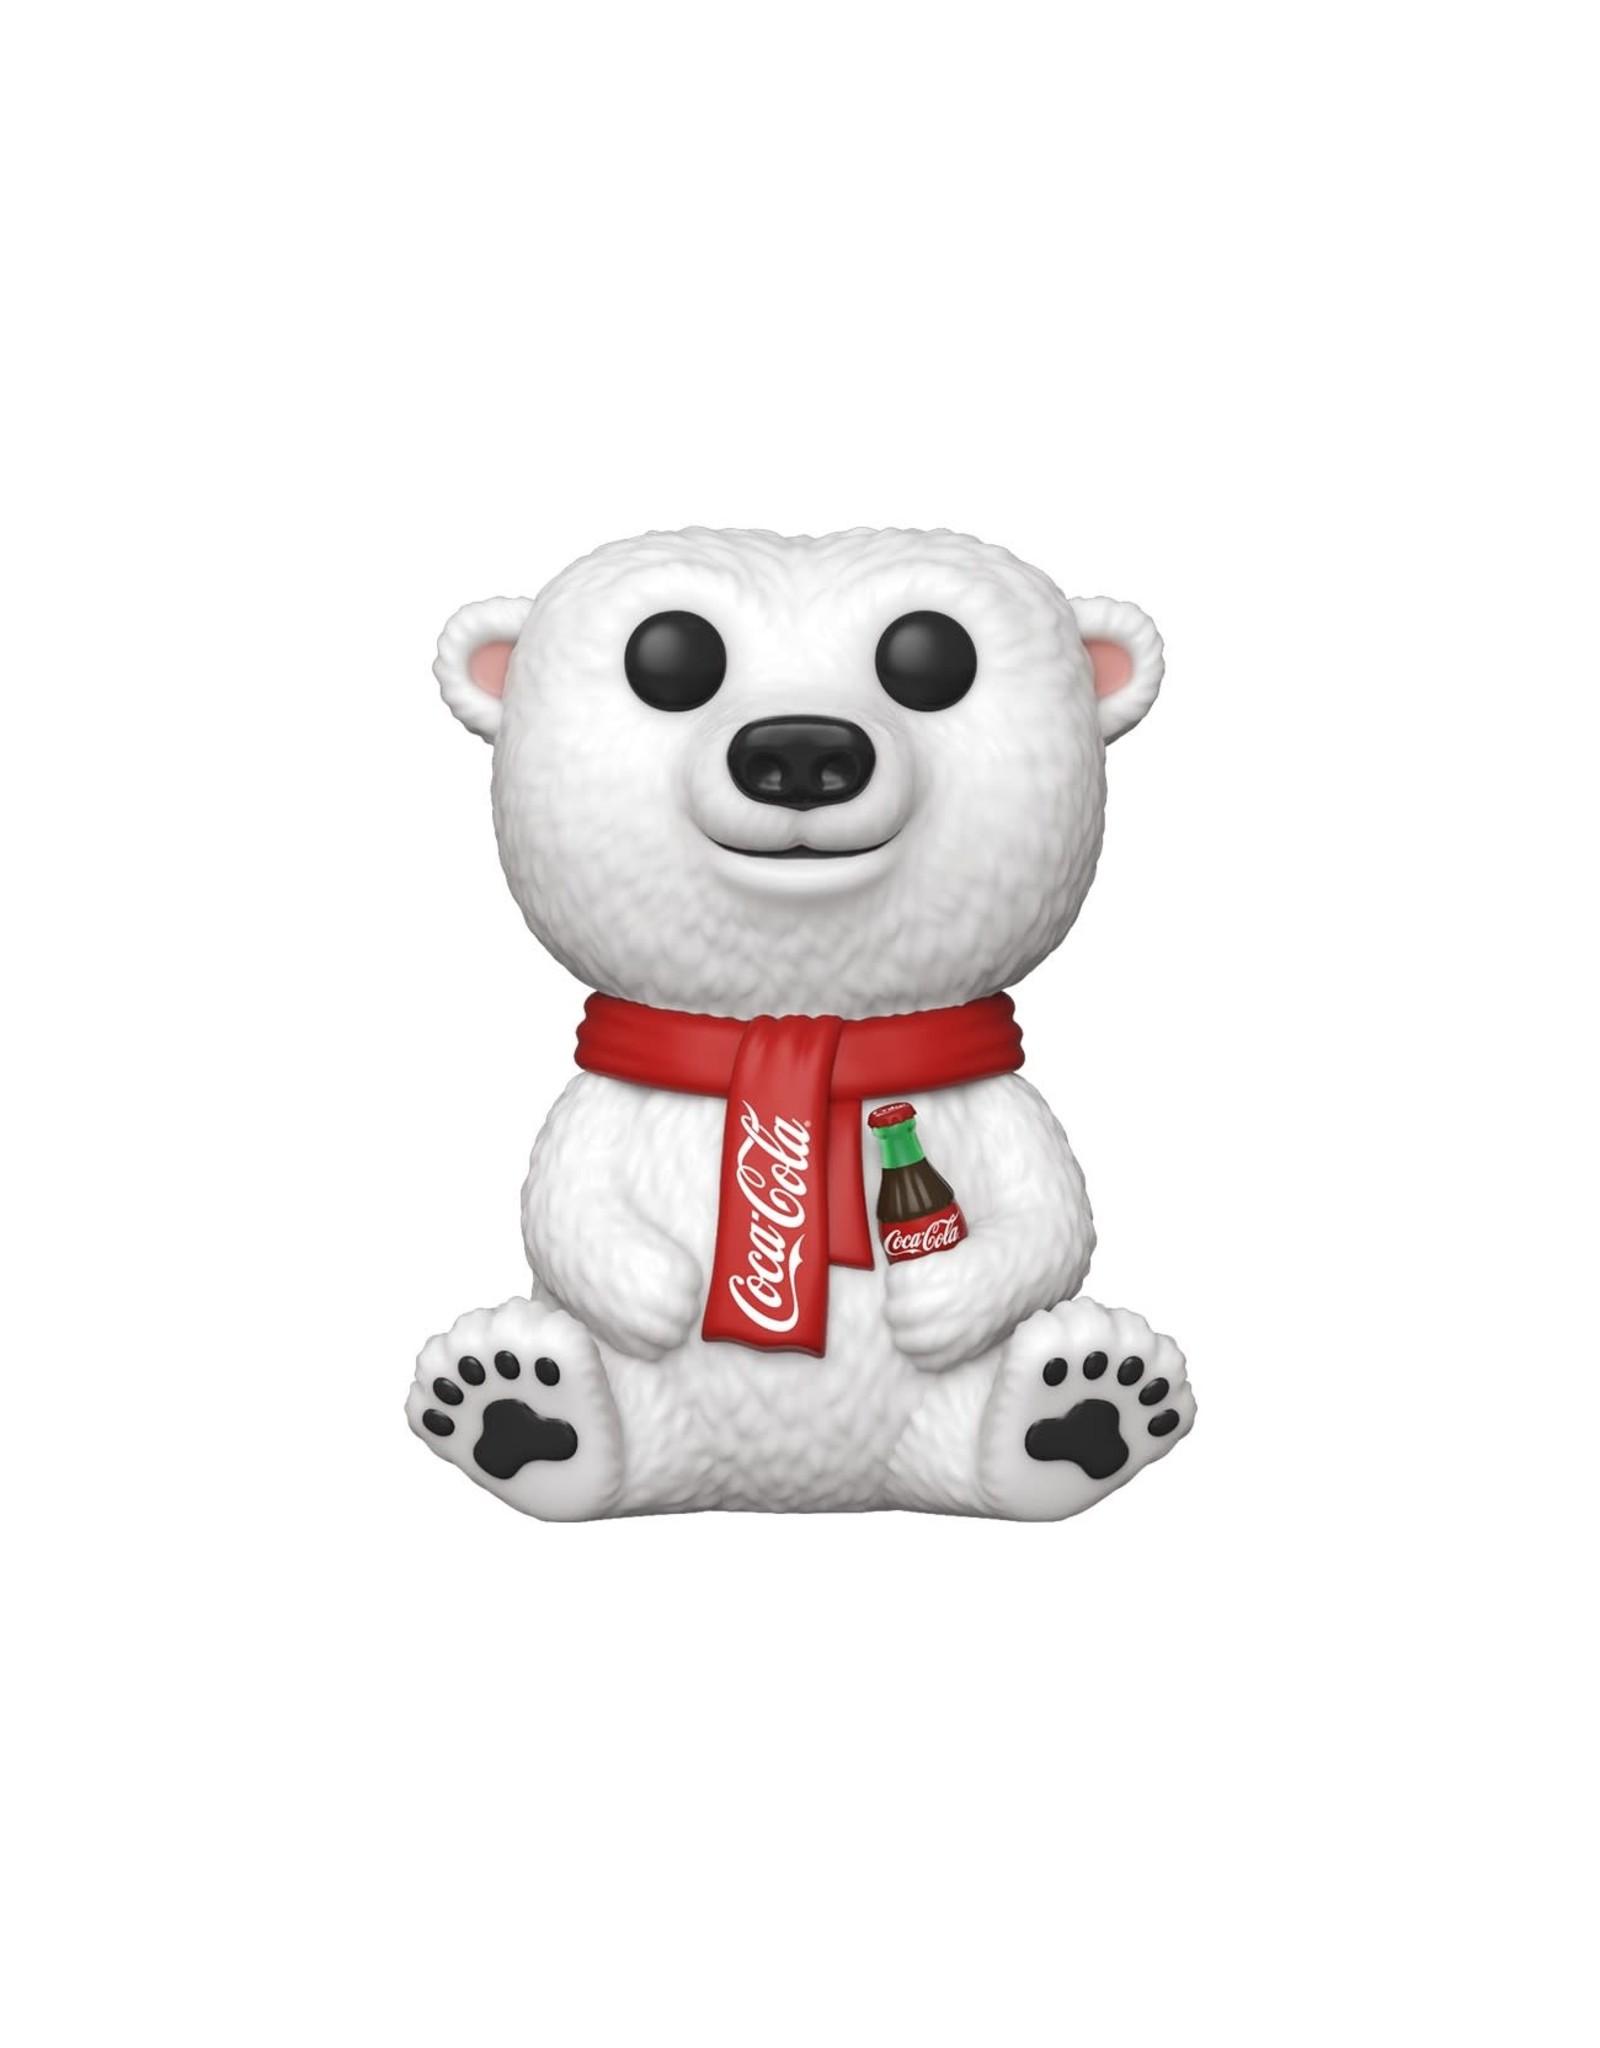 Funko Pop! Funko Pop! Ad Icons nr058 Coca-Cola - Polar Bear